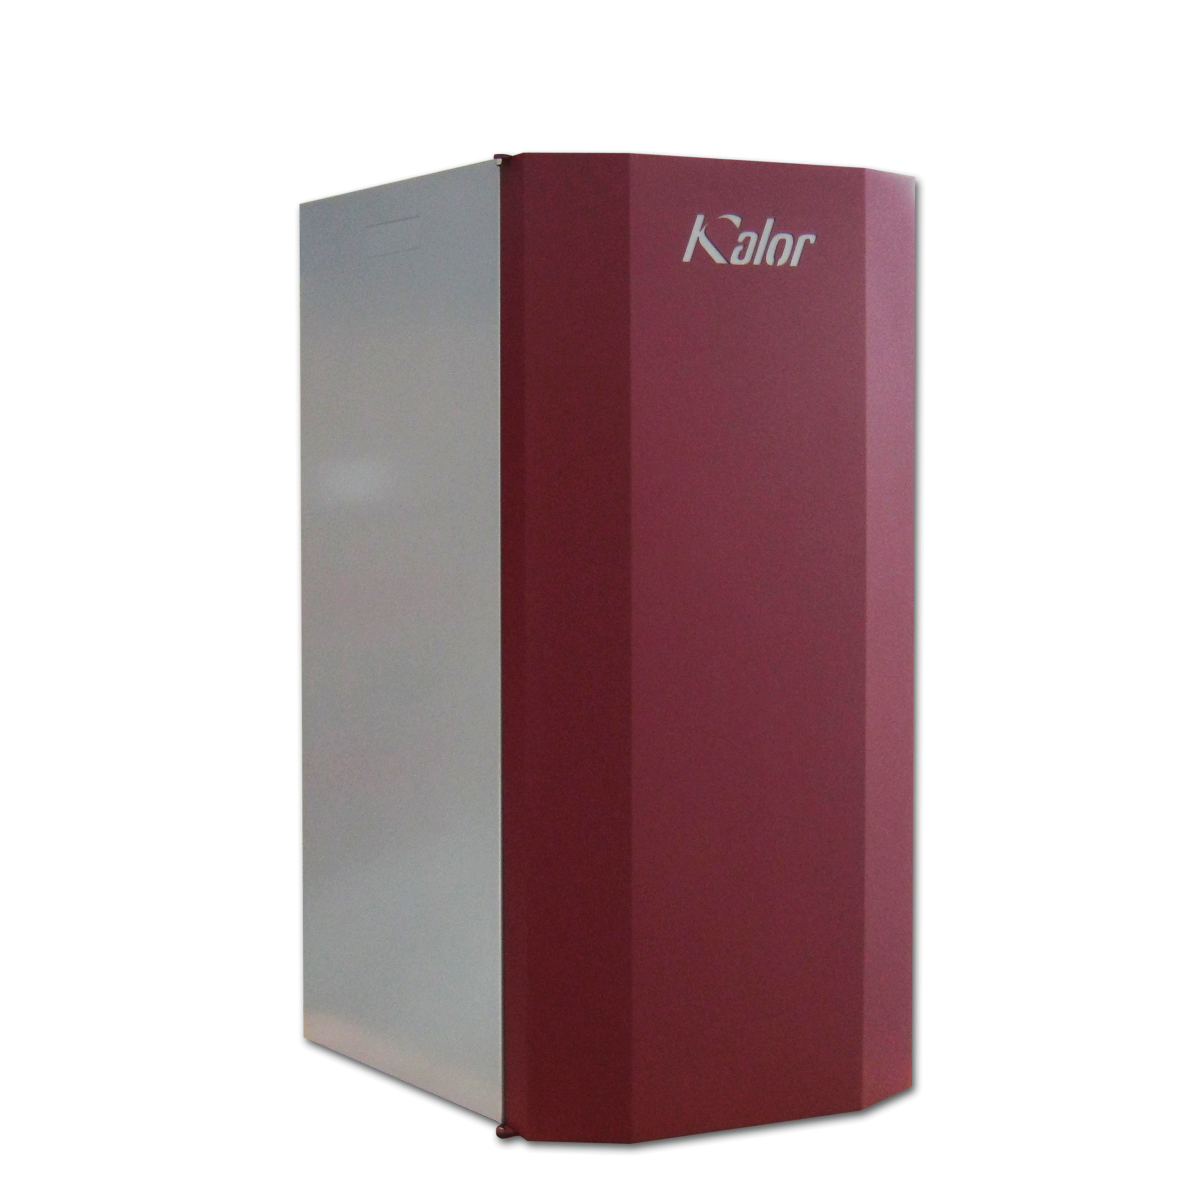 Caldaia idro a pellet Kalor 24 kw per riscaldamento radiatori hydro